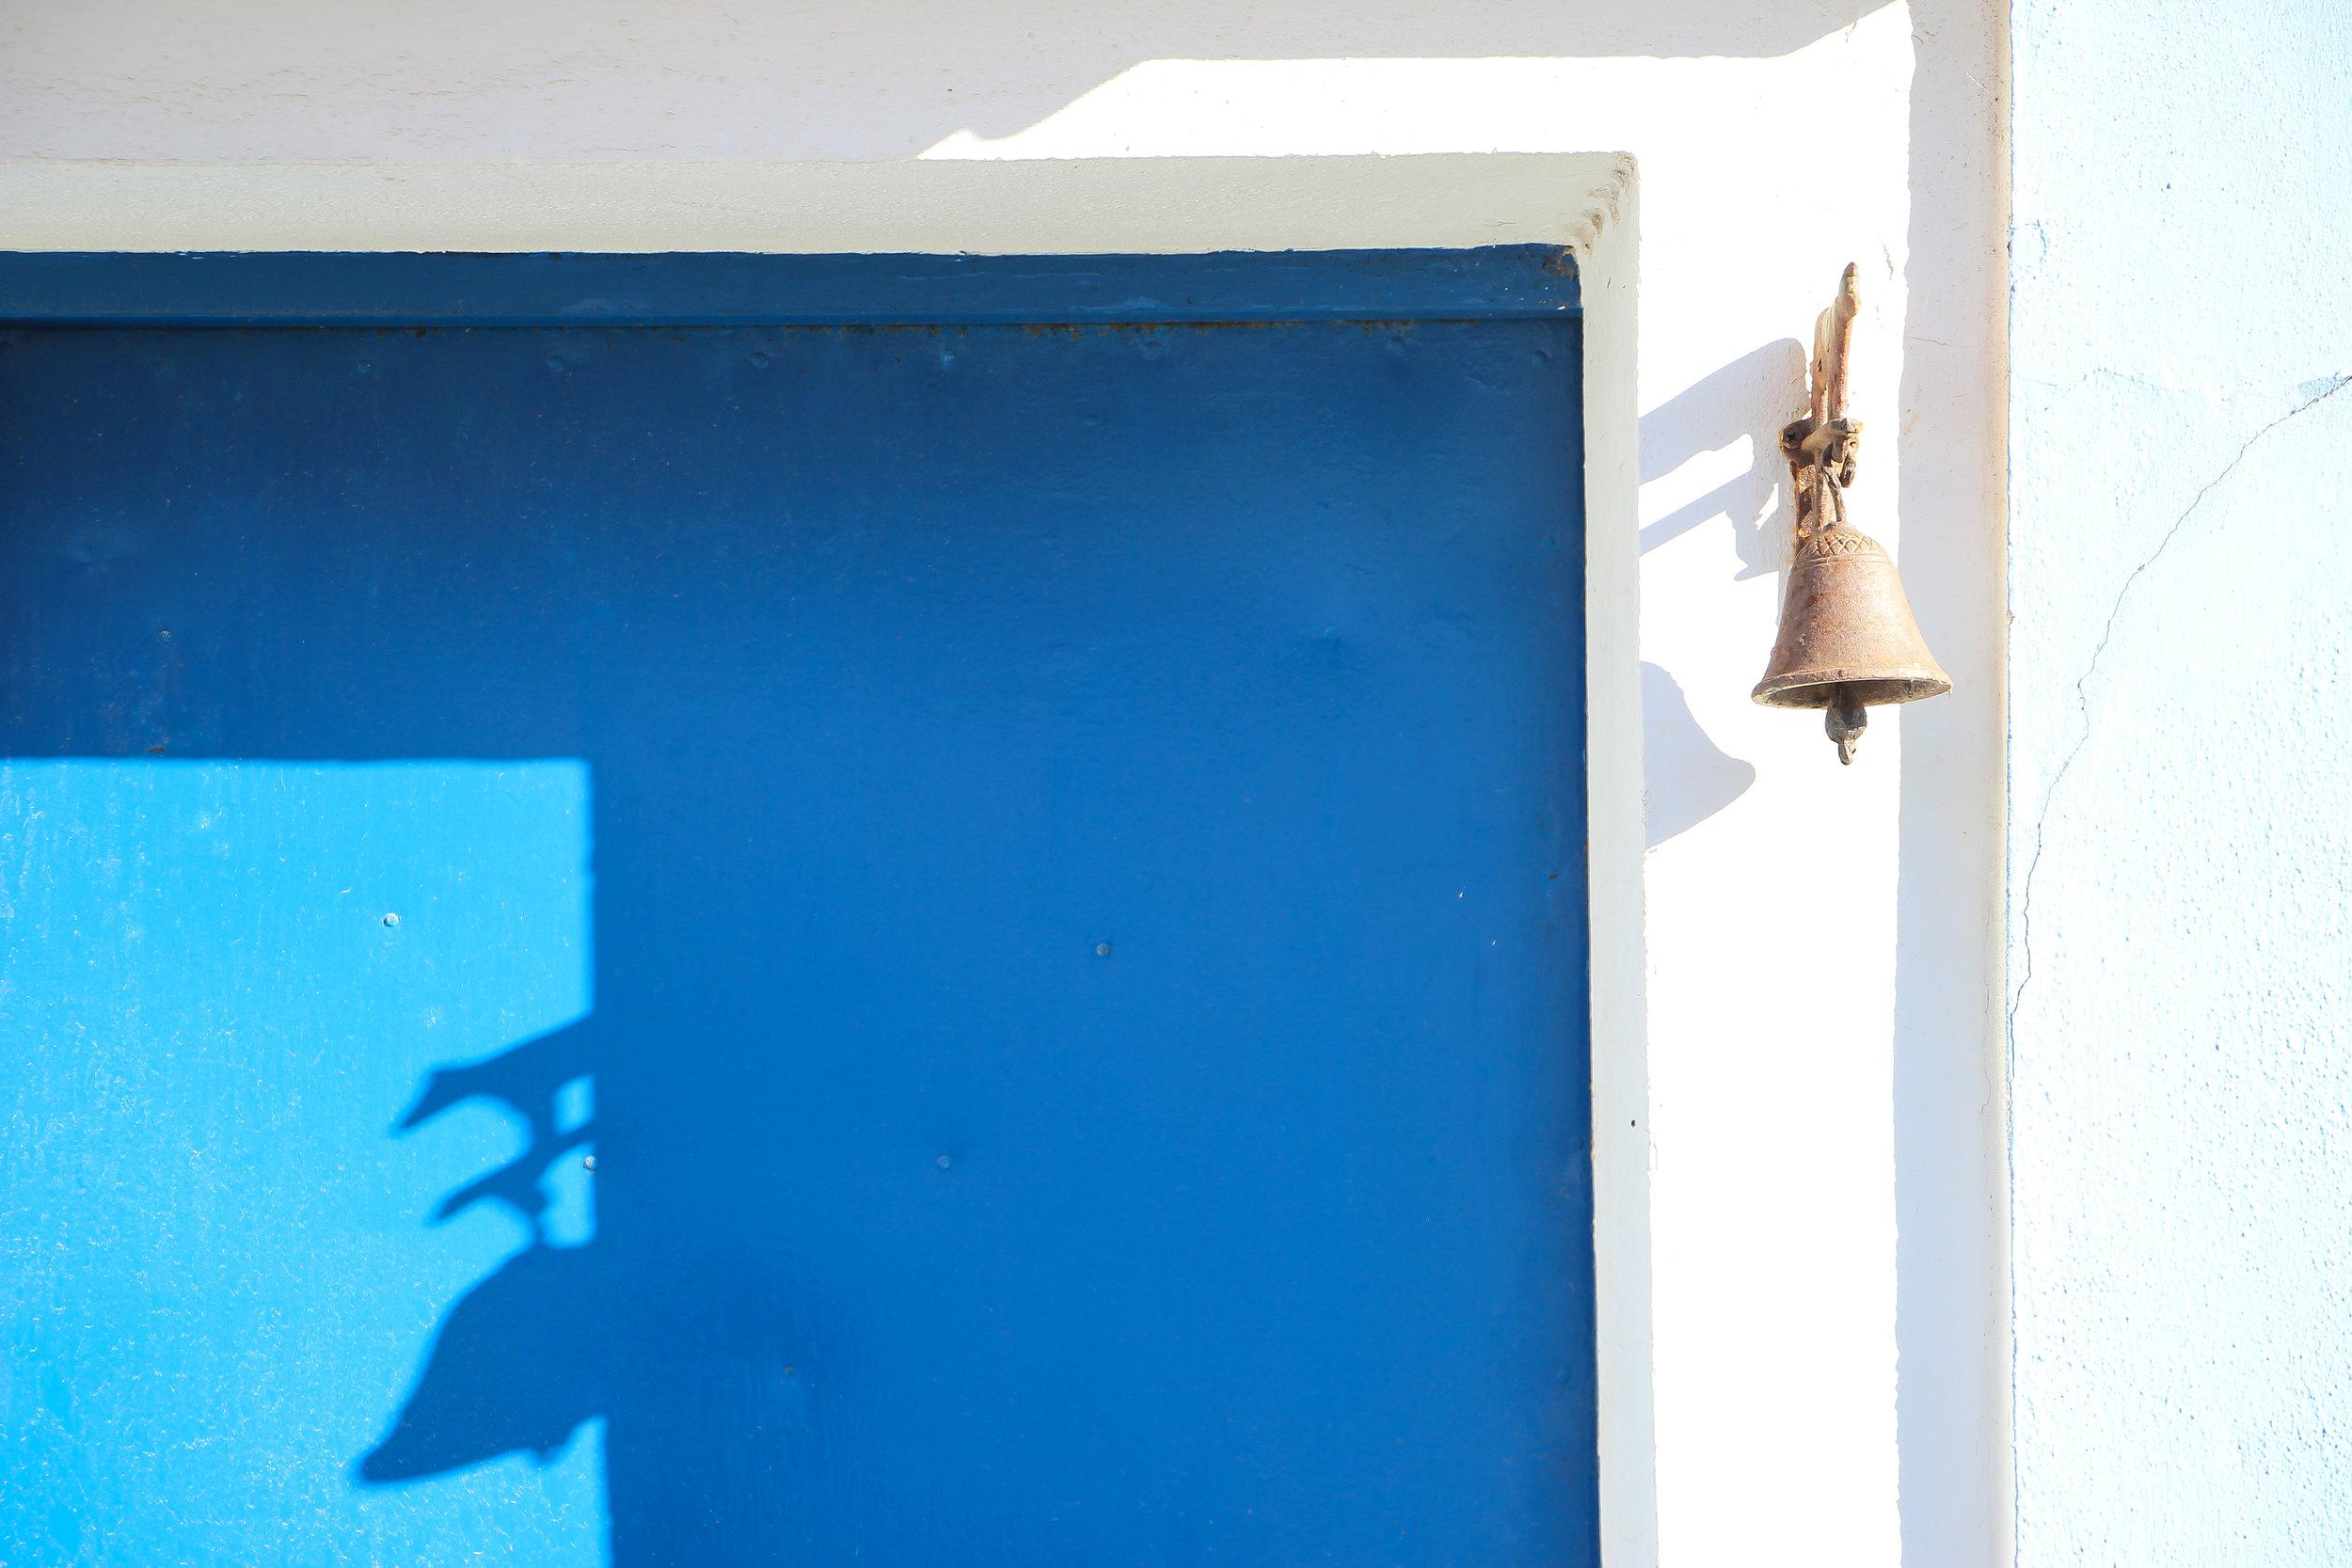 Vila Nova de Milfontes | Alentejo, Portugal, Europe | DoLessGetMoreDone.com | How to be on the good side of traveling?